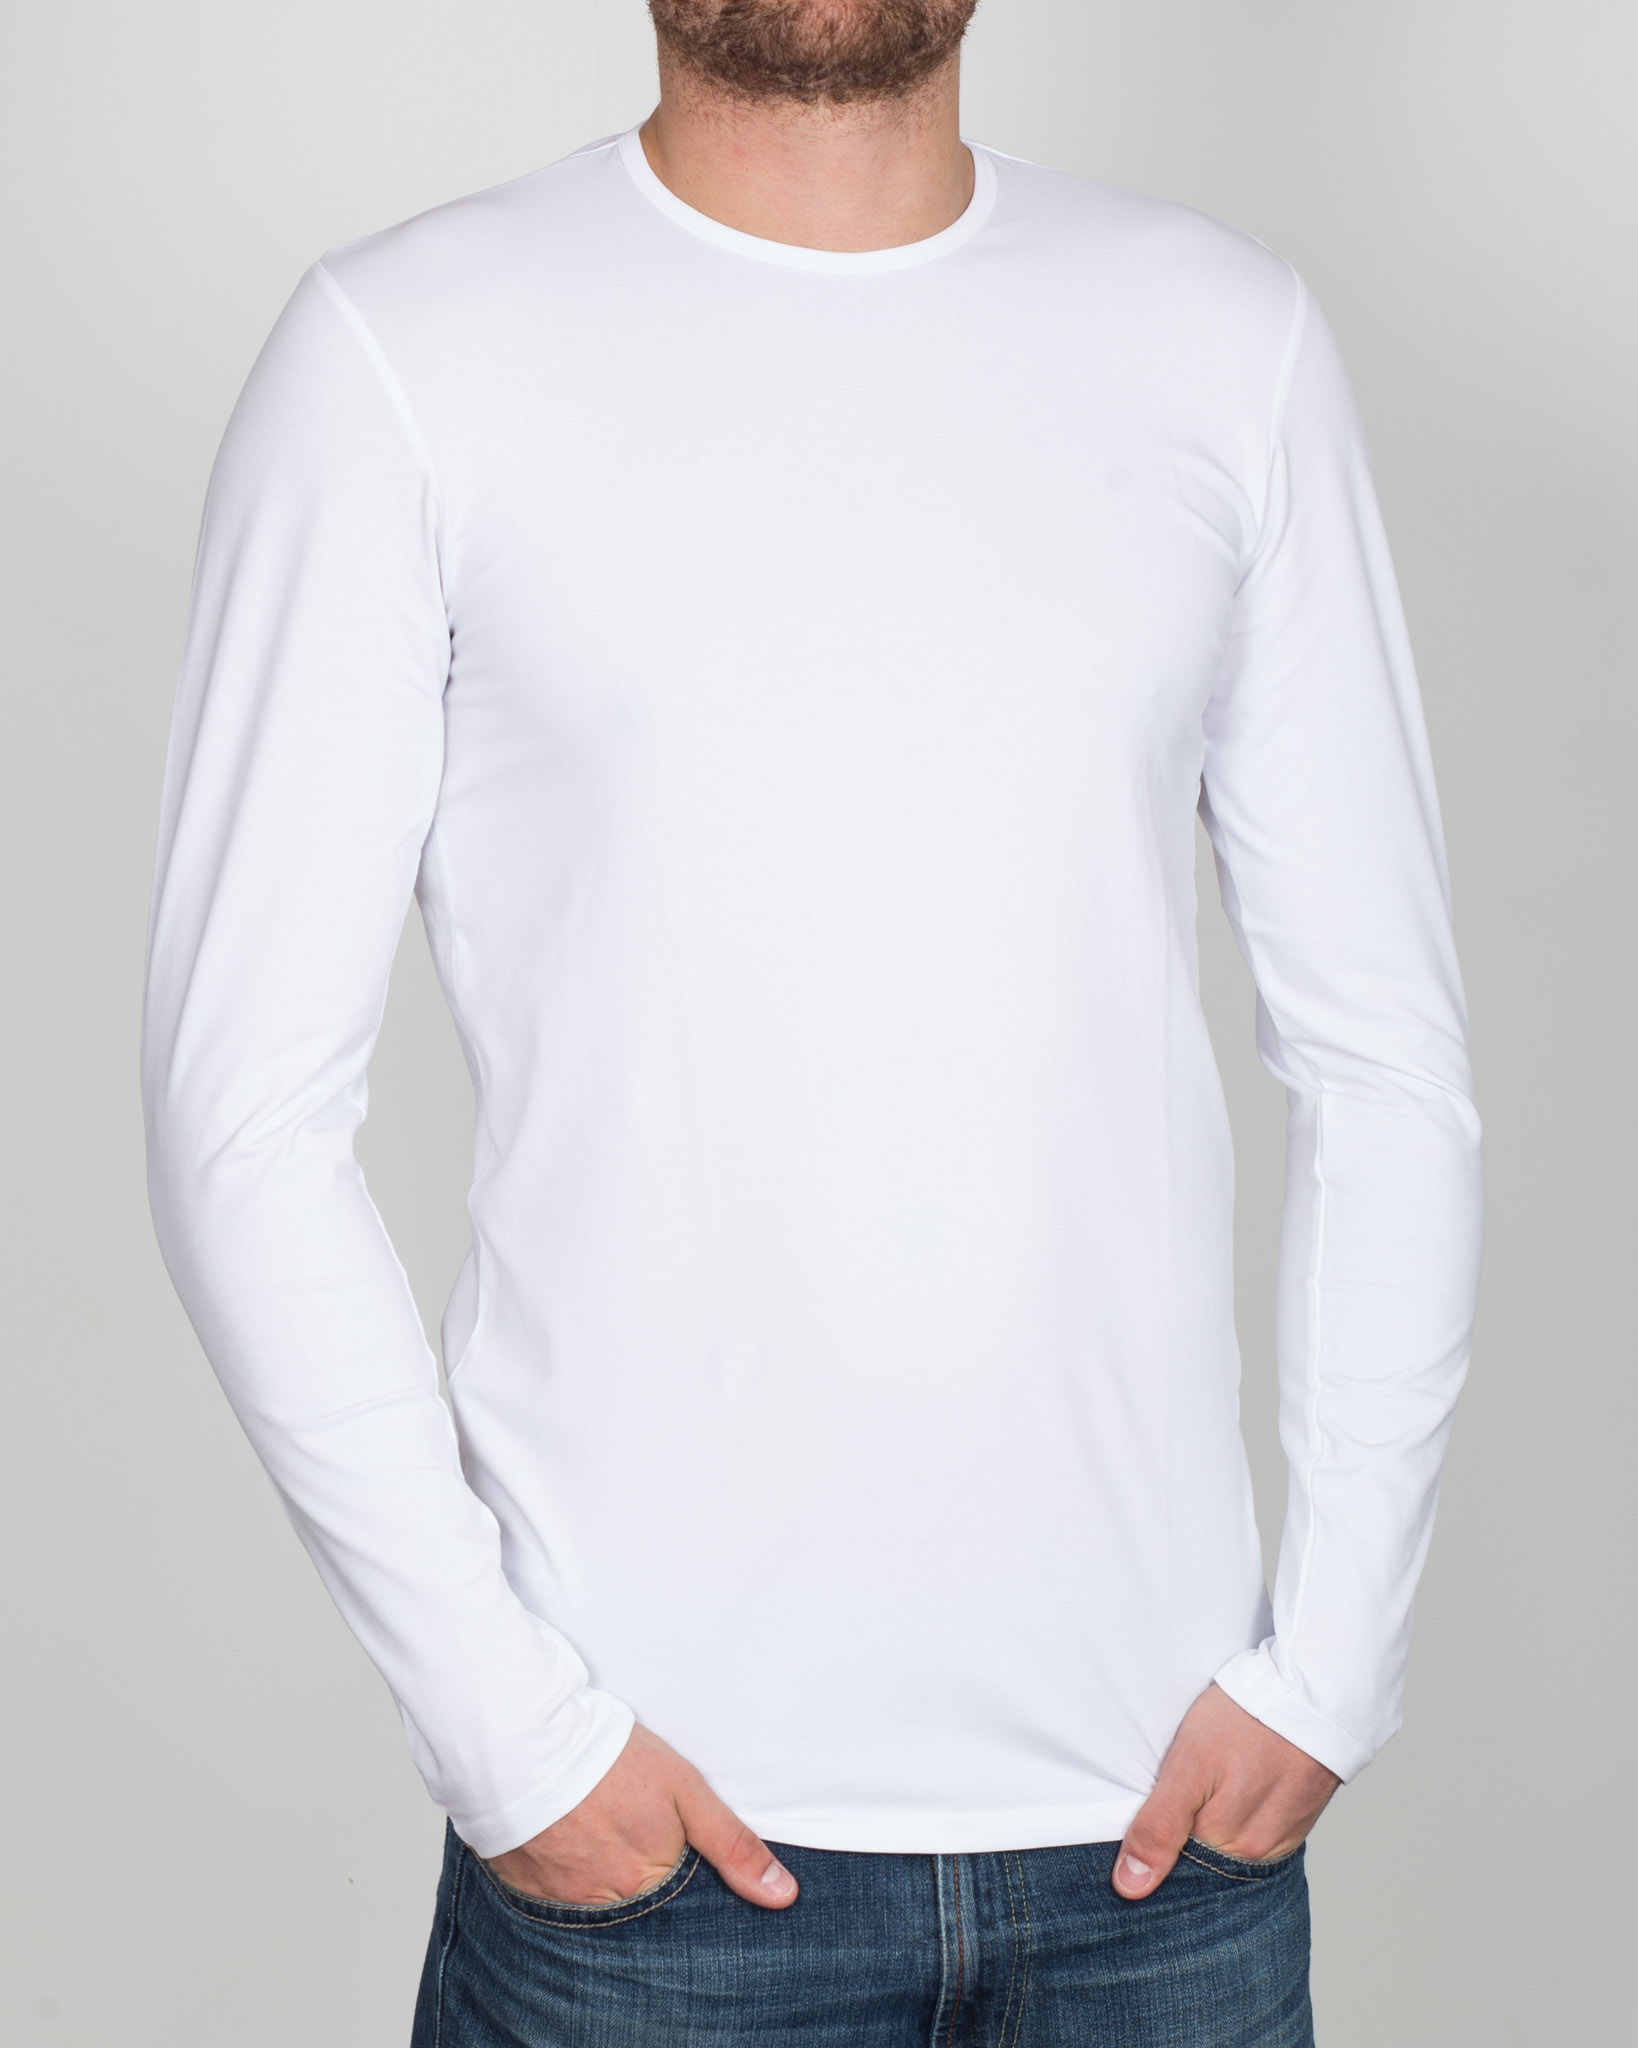 Girav London Long Sleeve Extra Tall T-Shirt (white)